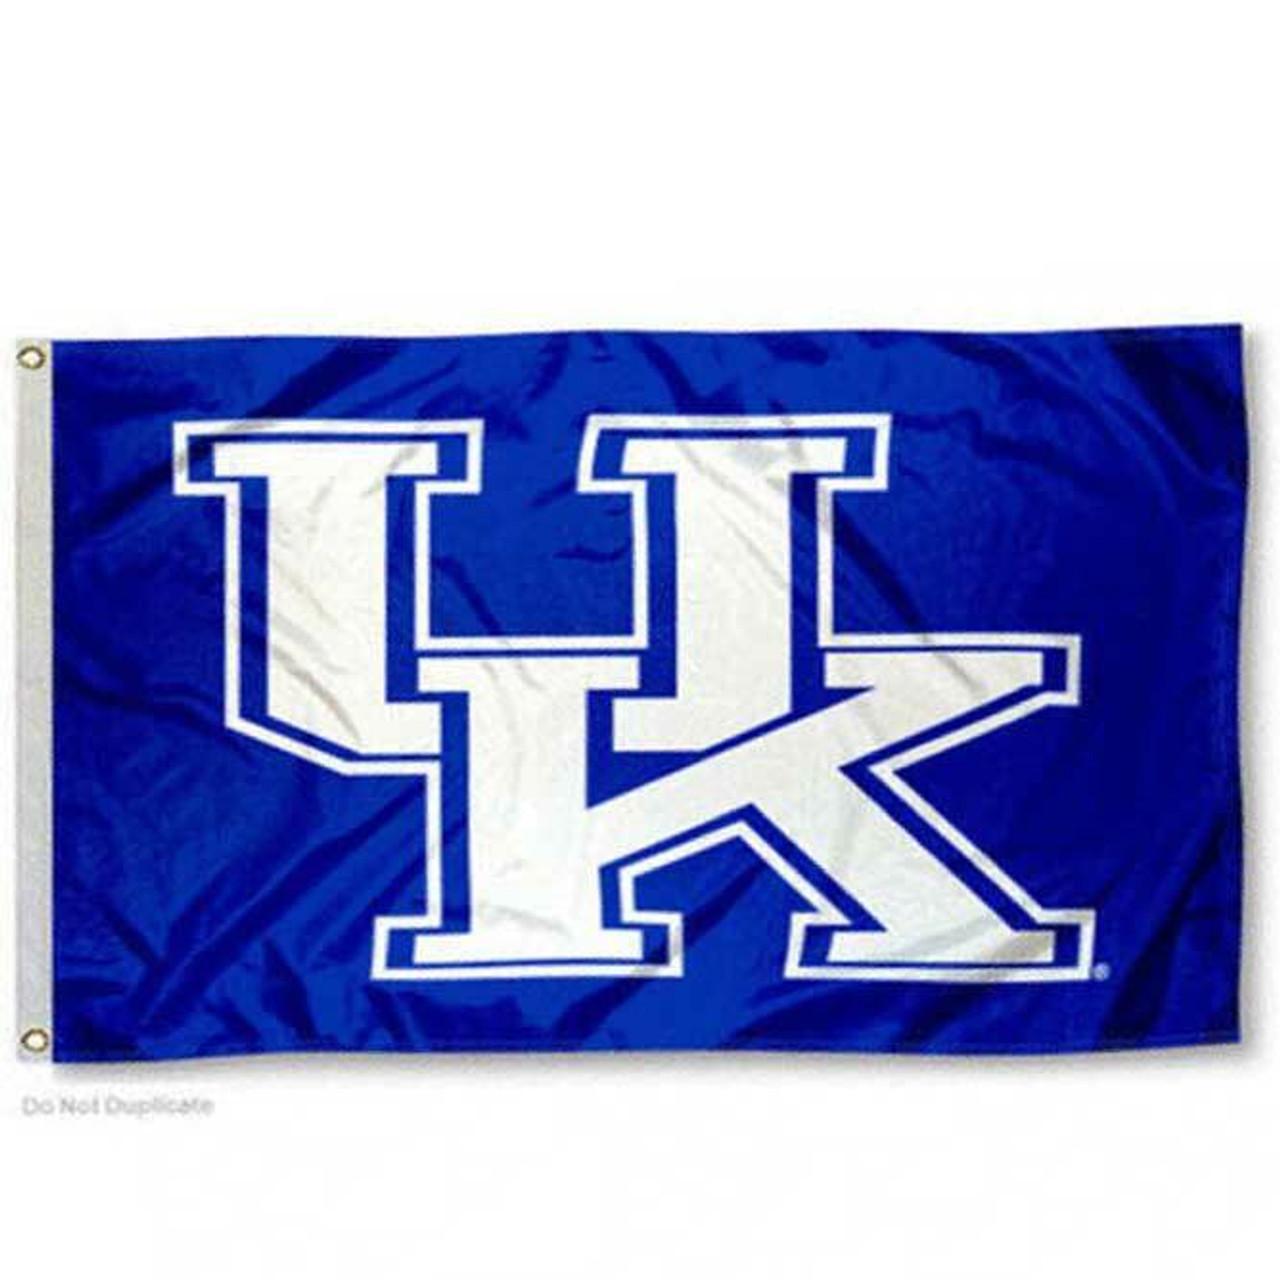 Kentucky University of Flag